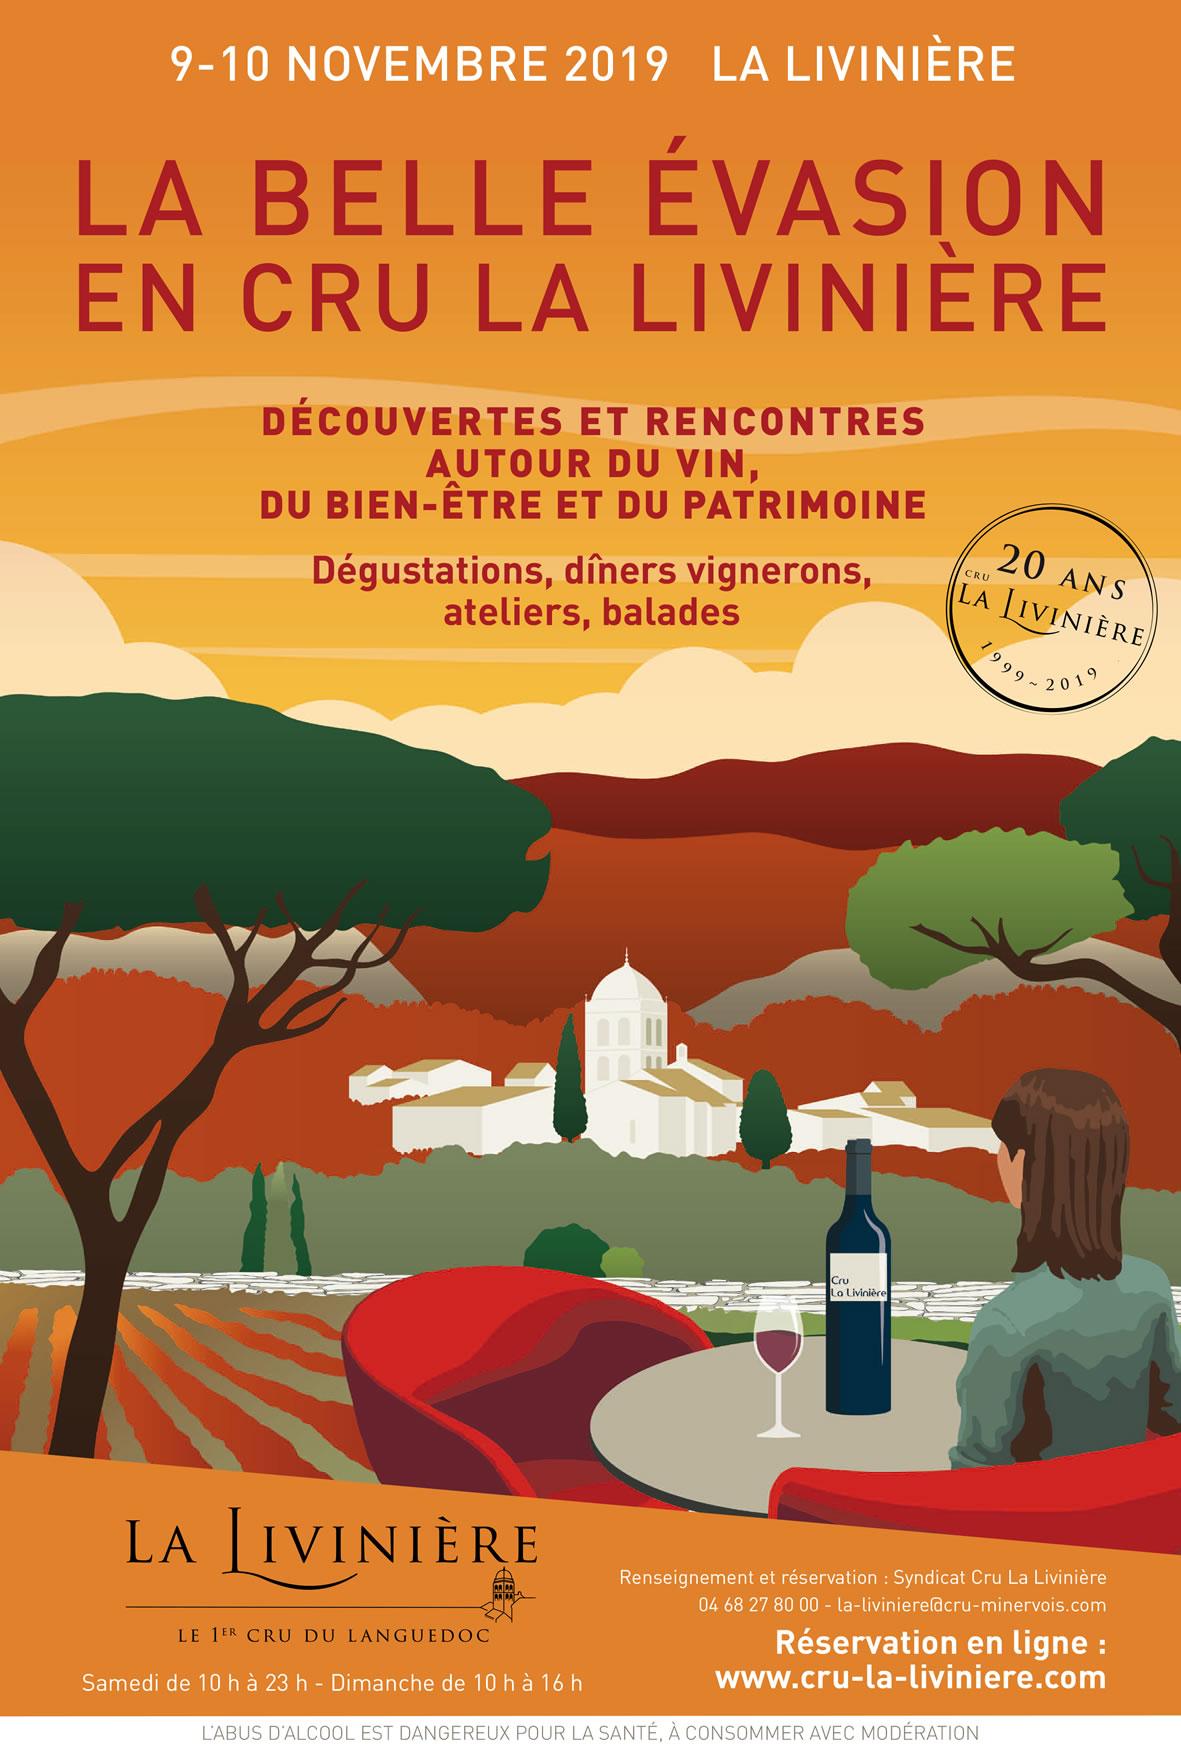 https://www.cru-la-liviniere.com/wp-content/uploads/2019/10/la-belle-evasion-Affiche.jpg